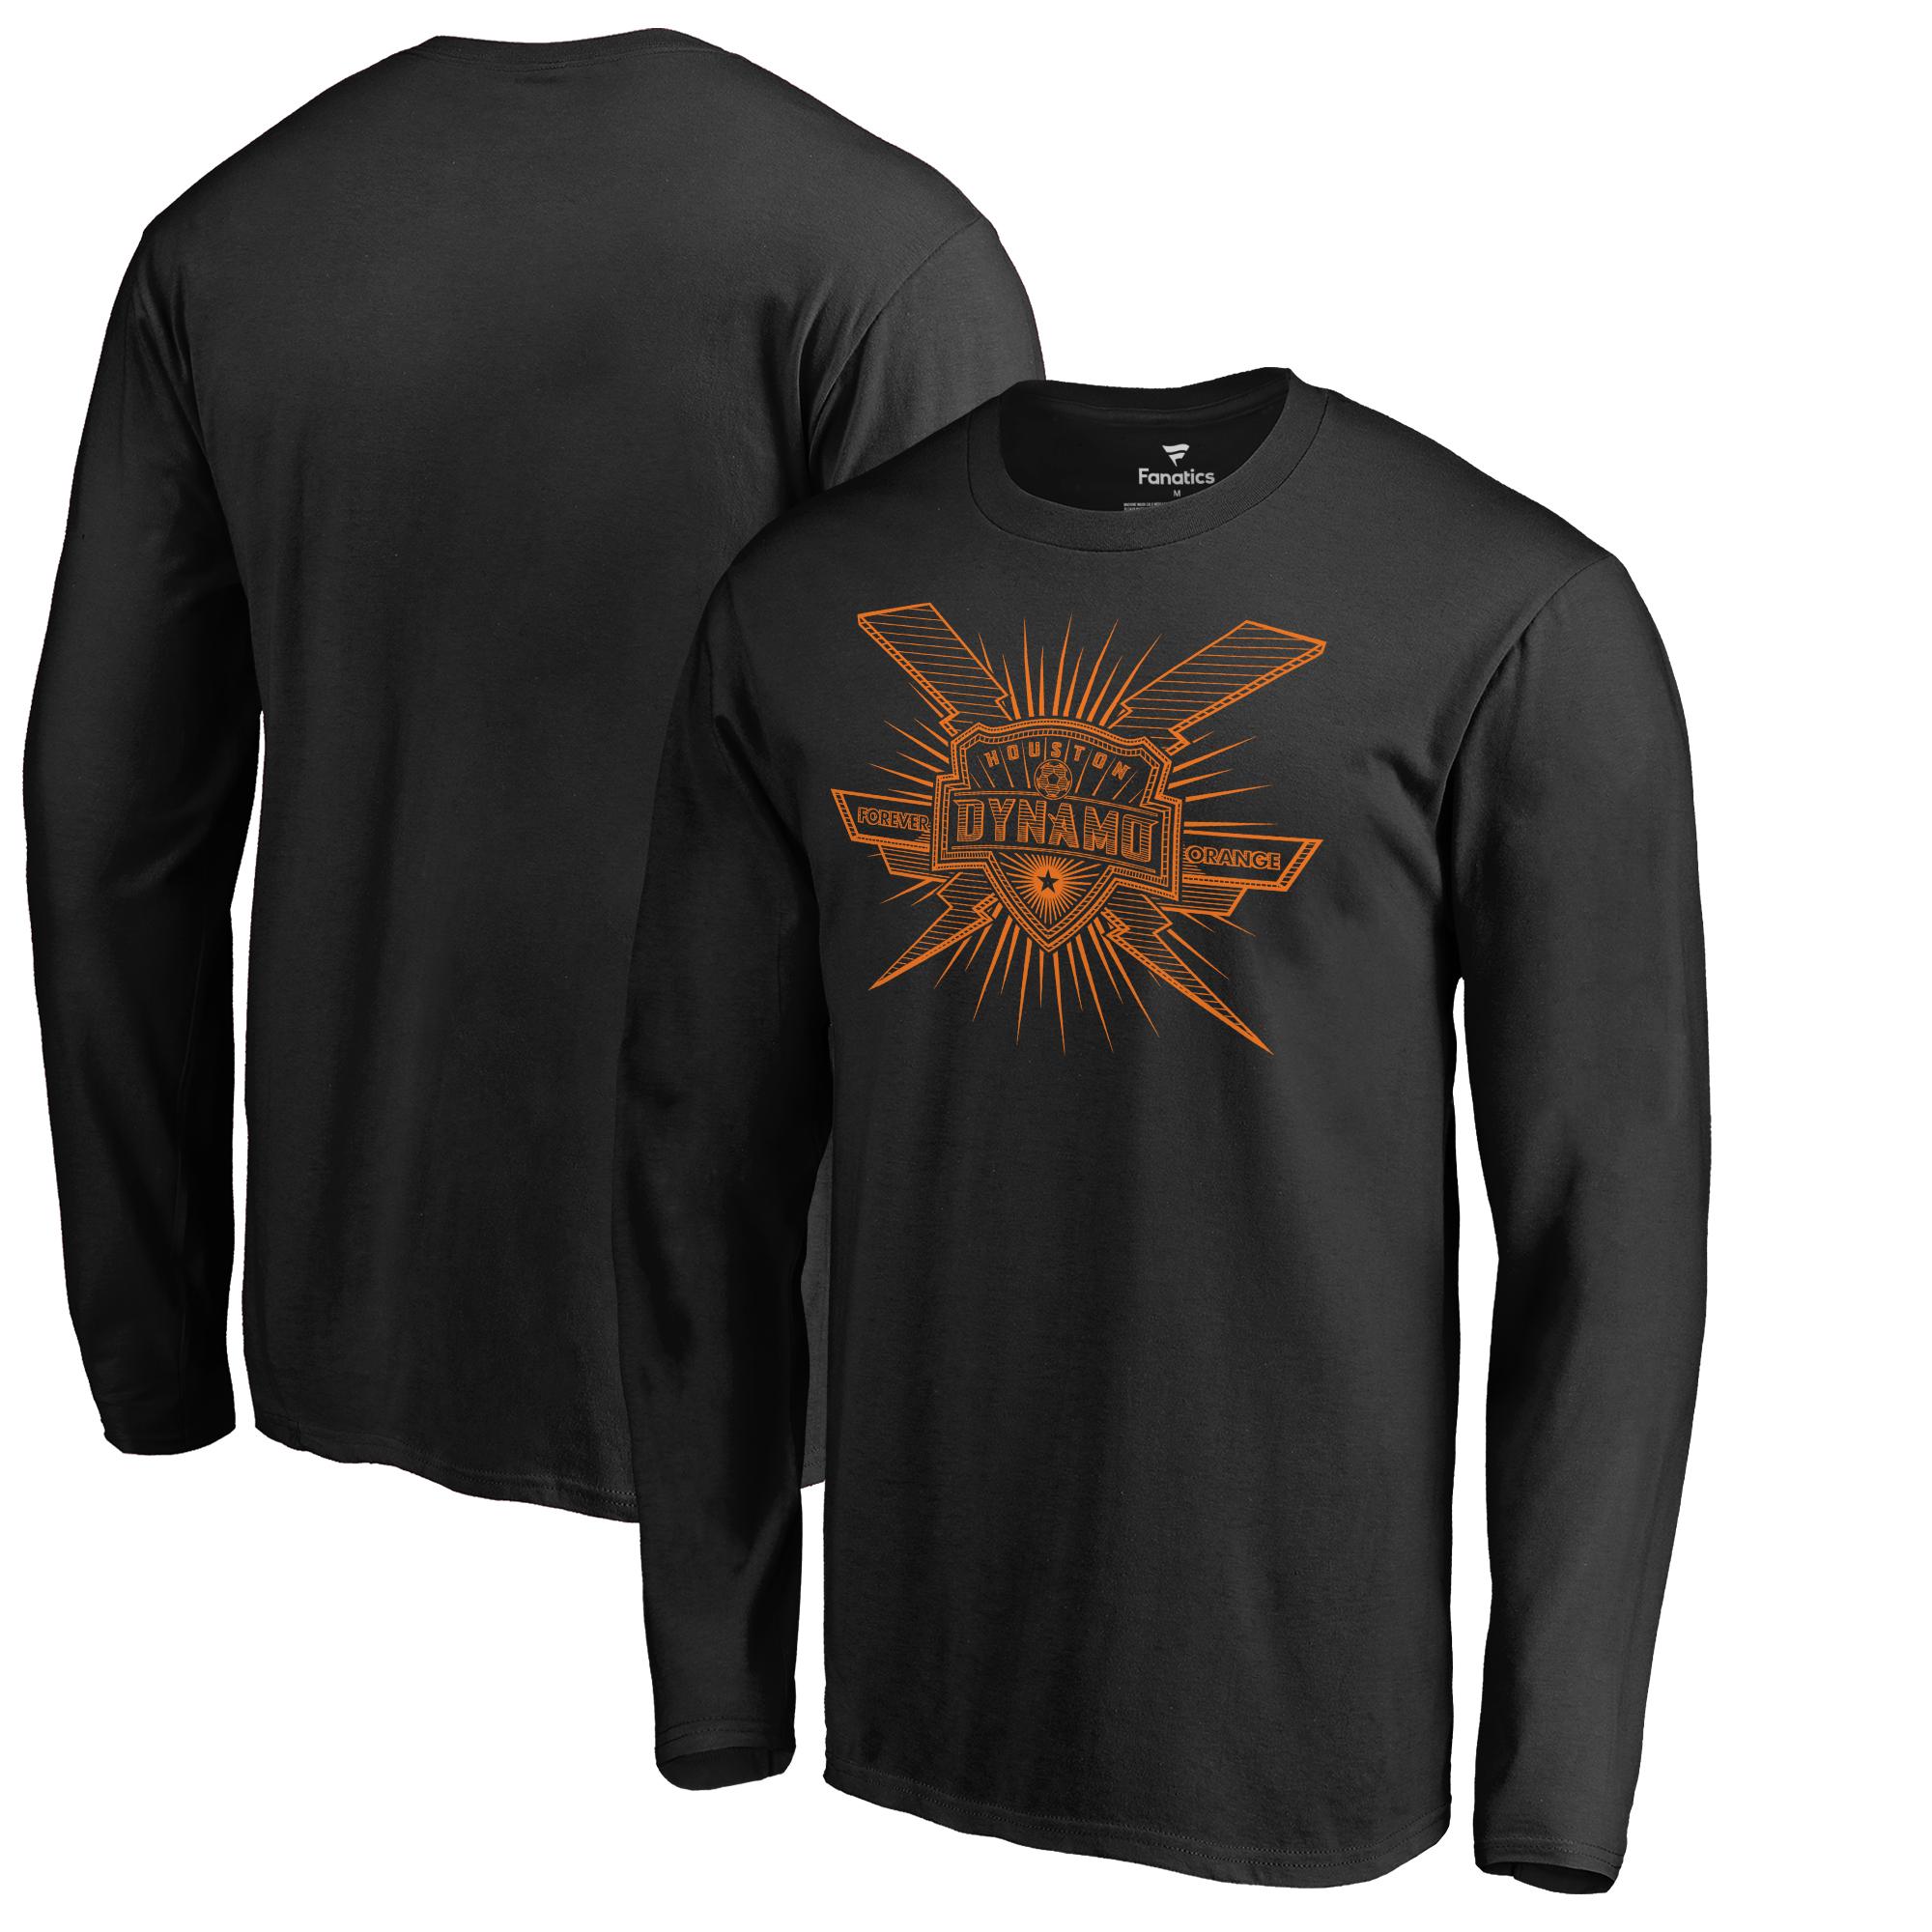 Houston Dynamo Fanatics Branded Lined Long-Sleeve T-Shirt - Black